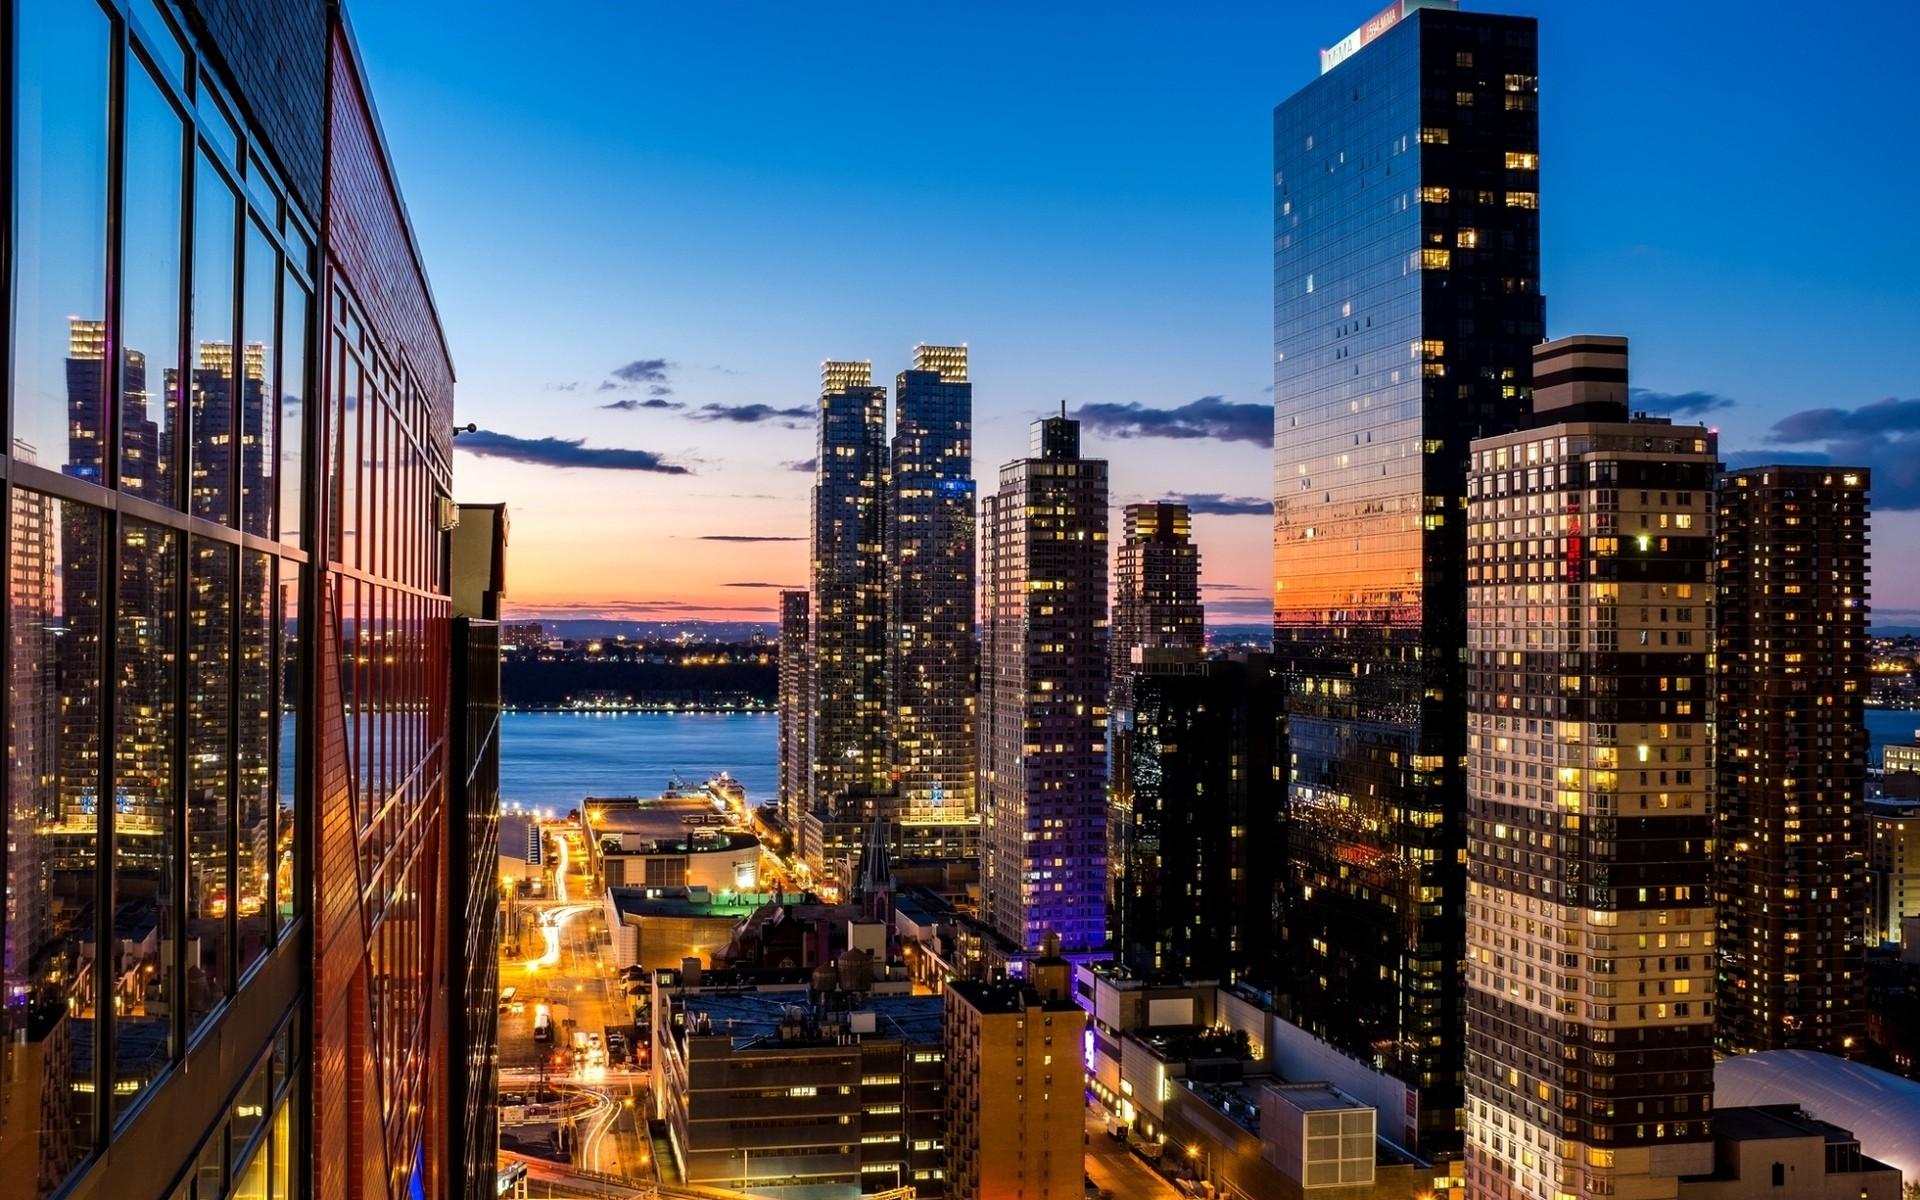 Cityscape Architecture Building New York City USA Skyscraper Sunset Evening Street Light River Windo 1920x1200